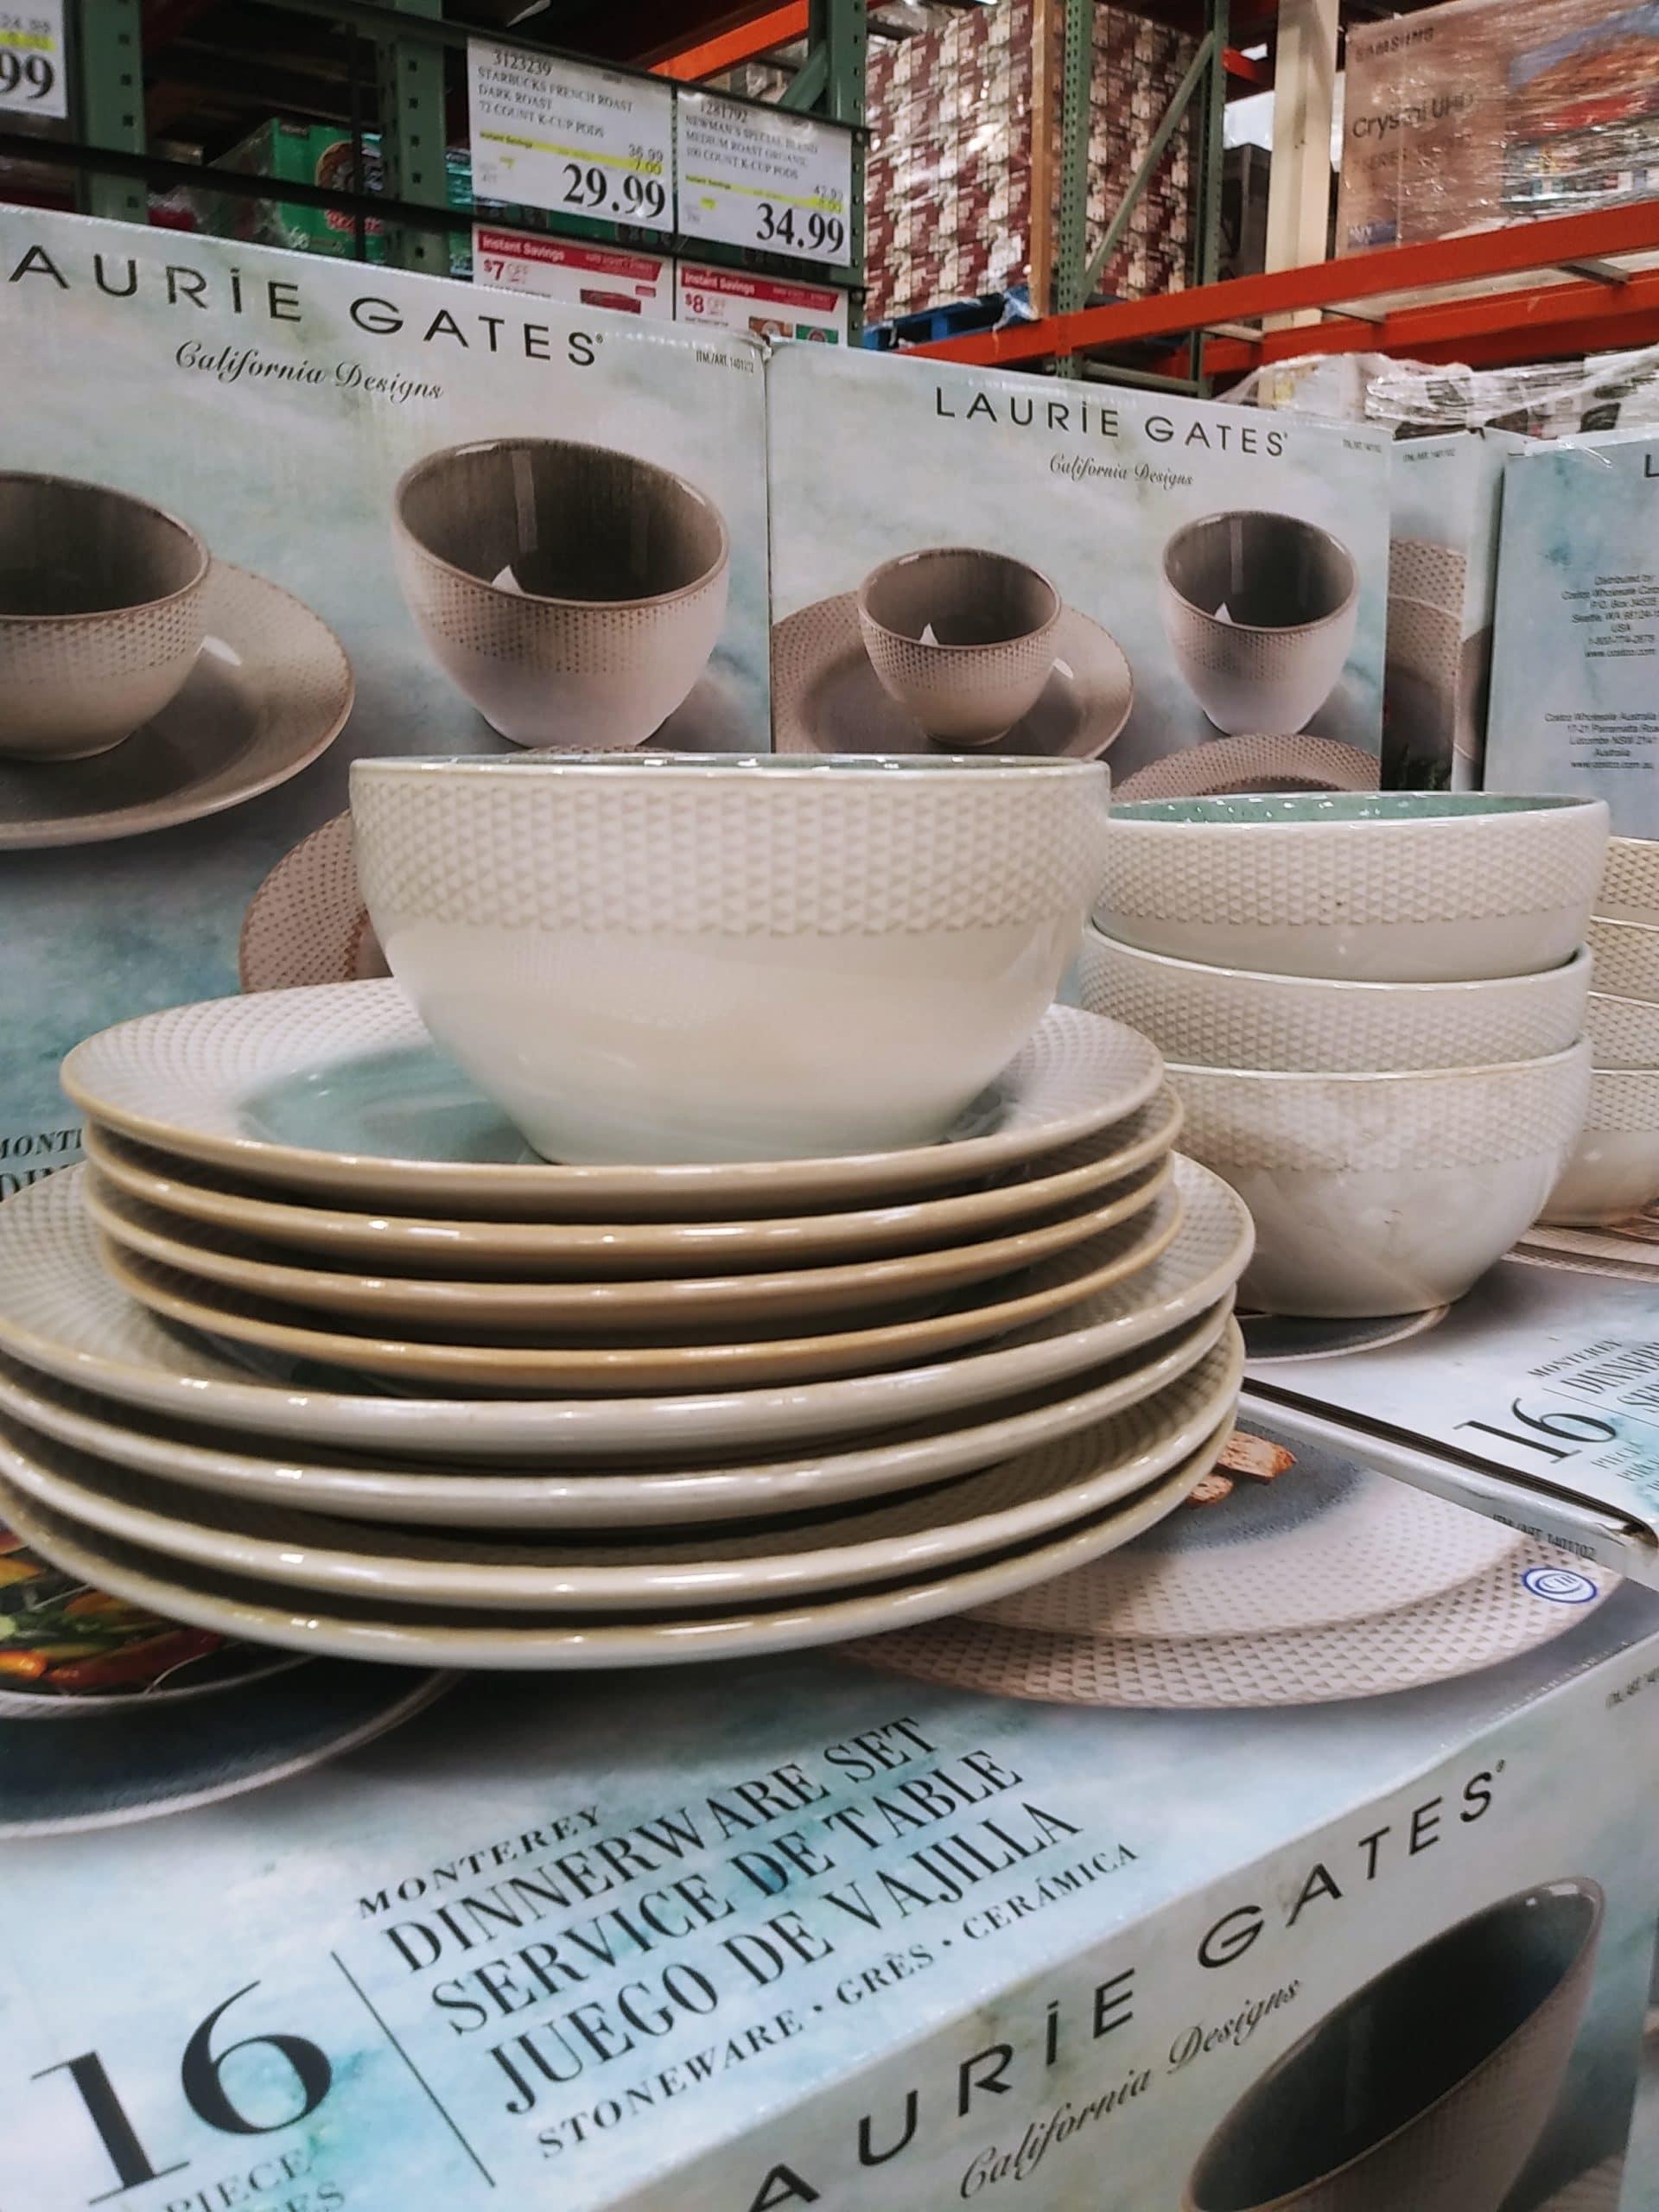 Laurie Gates Monterey 16pc Dinnerware Set $39.99